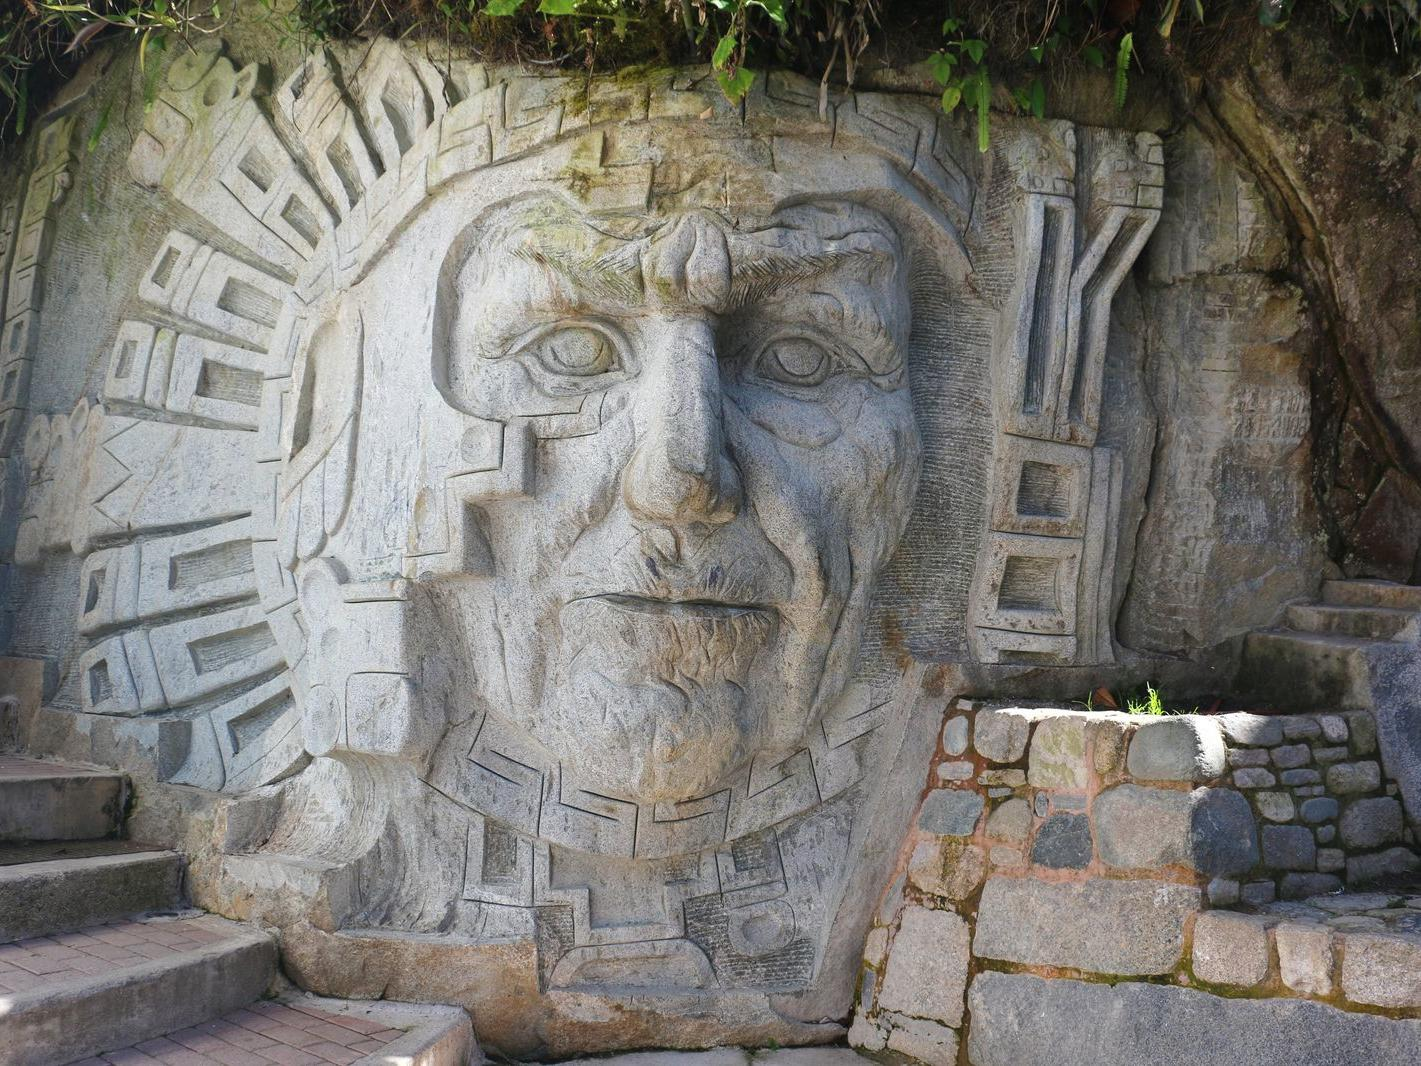 Ancient sculpture in Sculpture Circuit near Hotel Sumaq